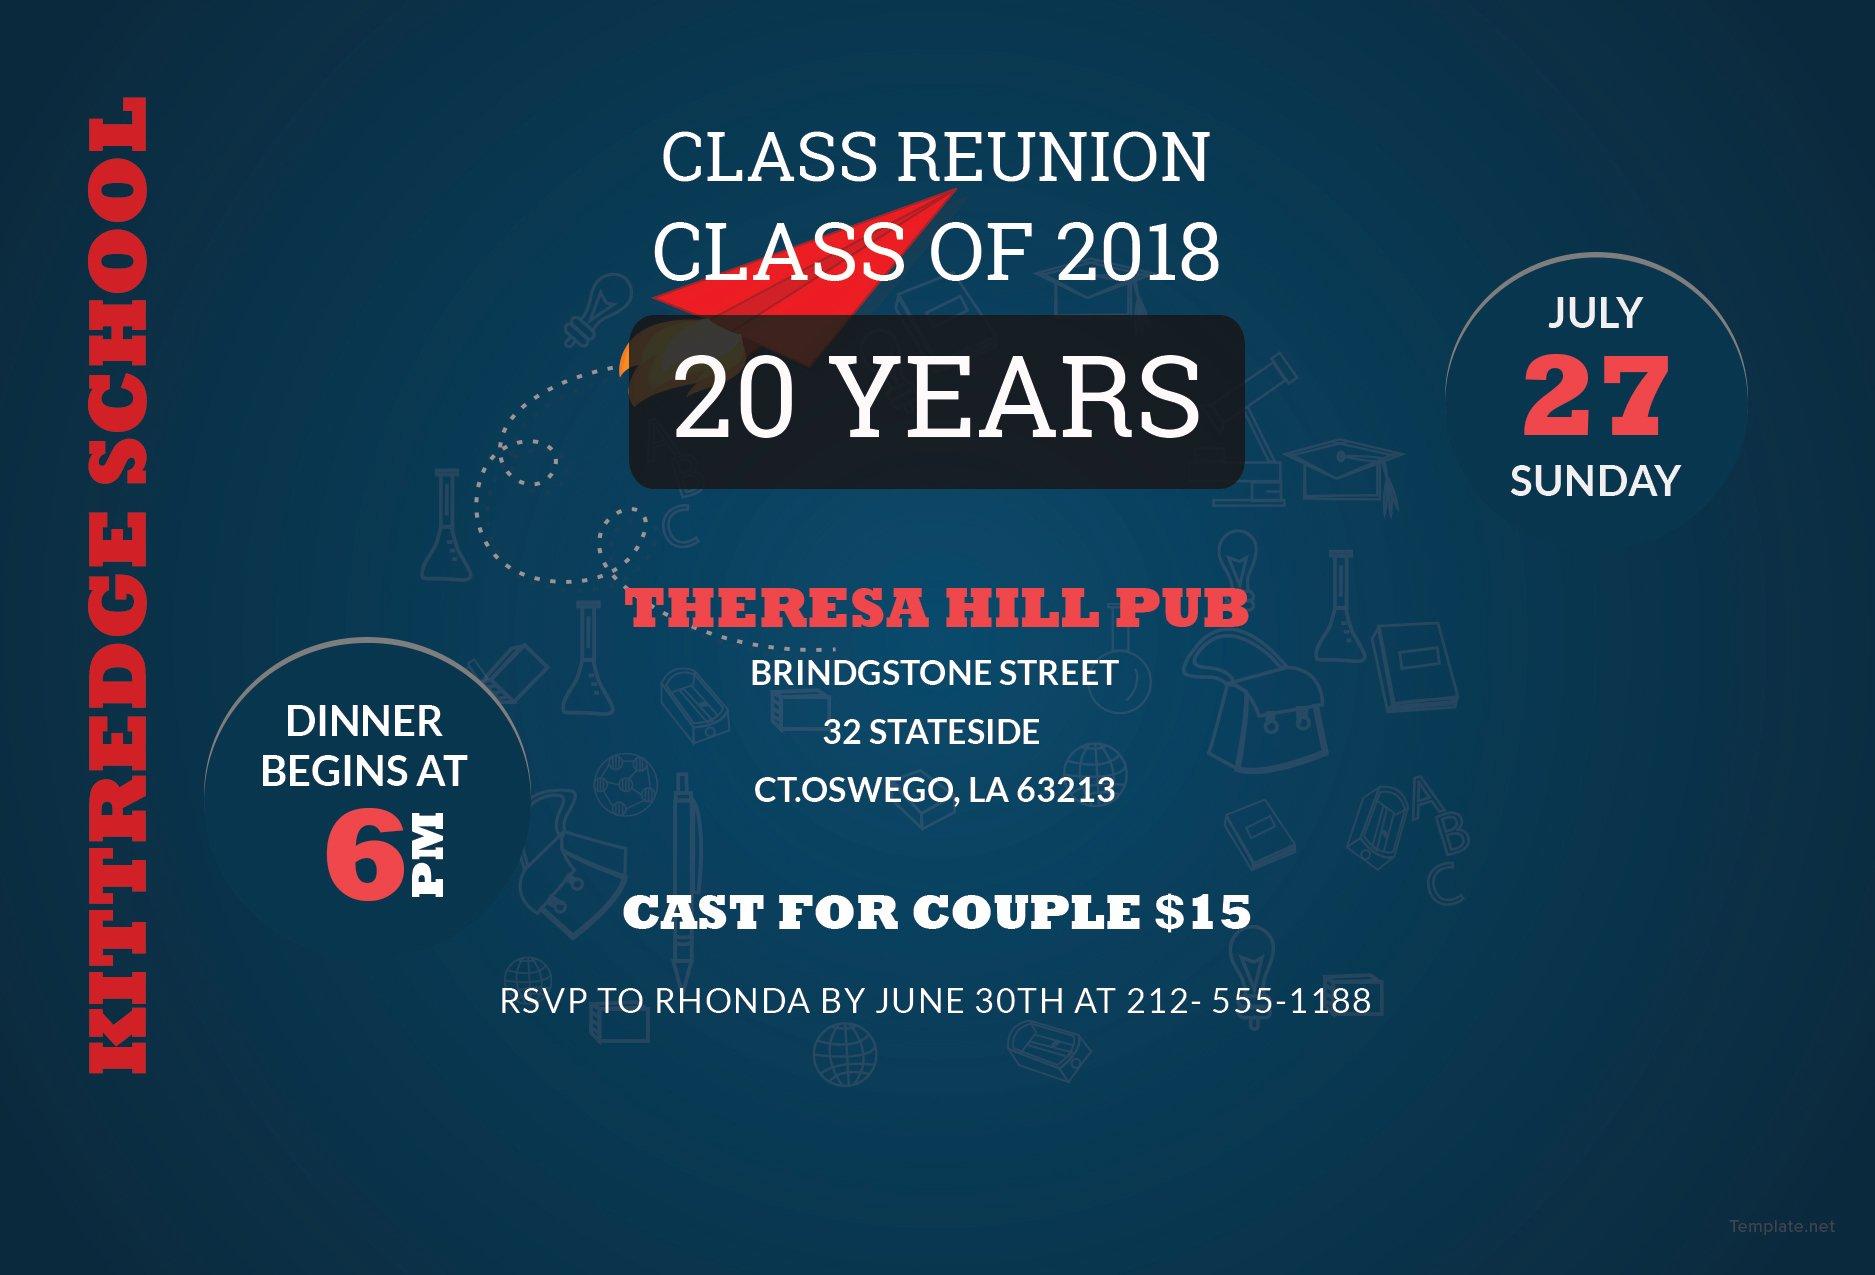 Free Class Reunion Invitation Template in Adobe Photoshop ...